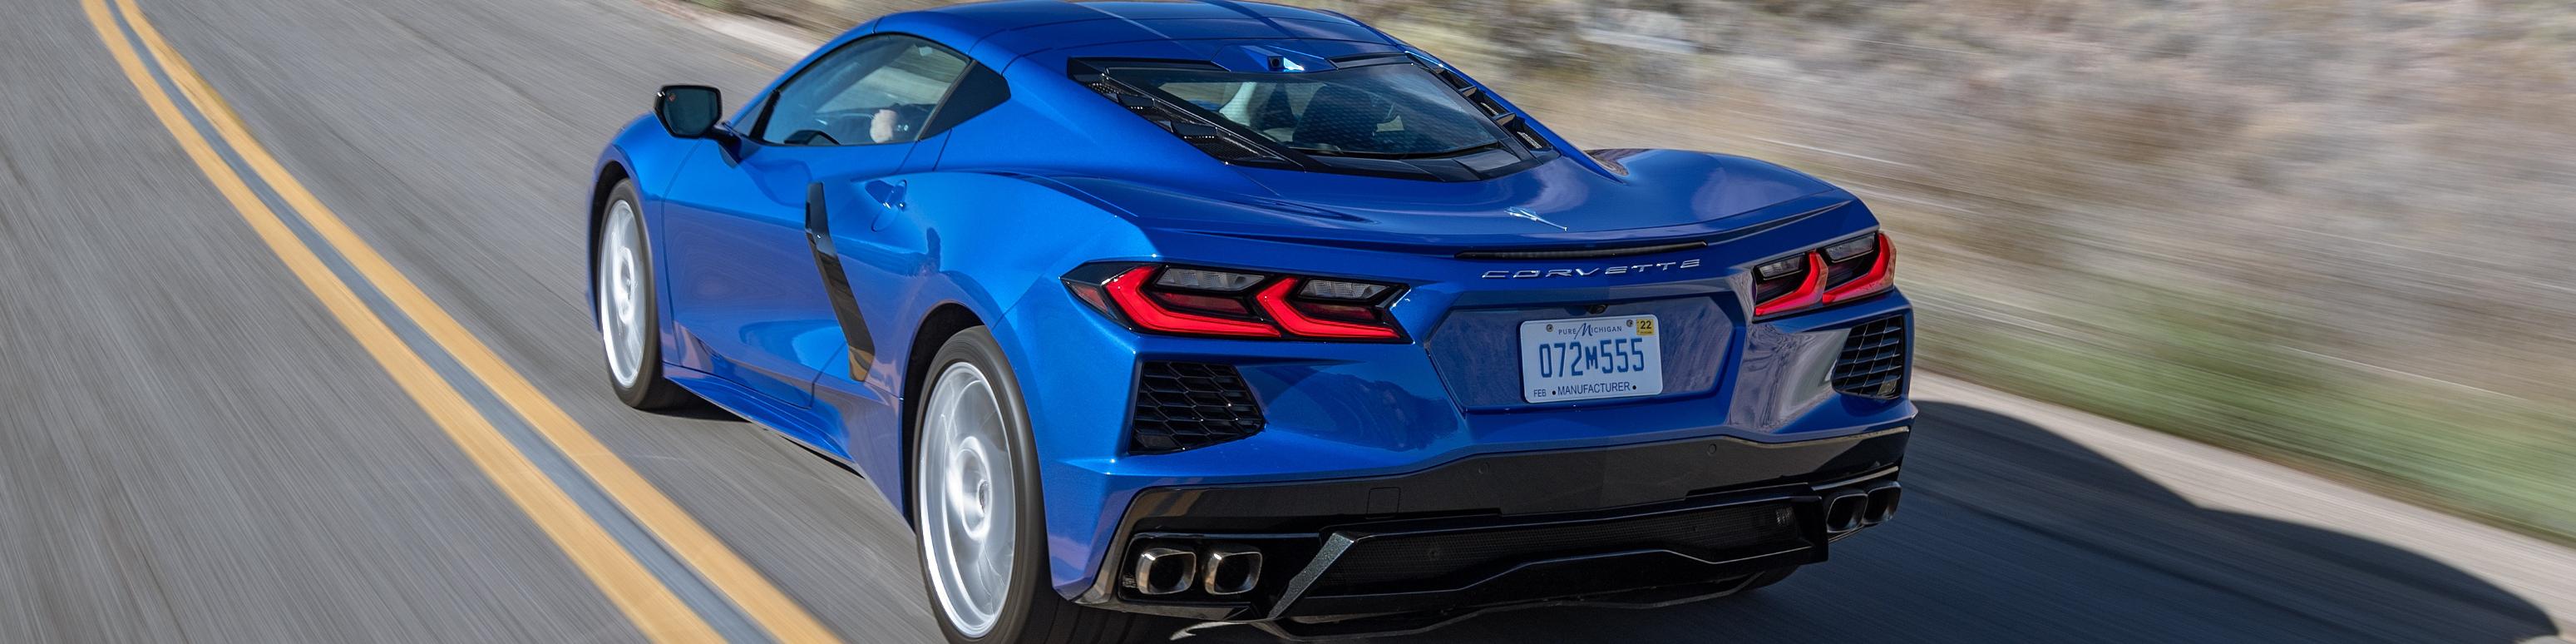 Corvette with pultruded composite rear bumper beam